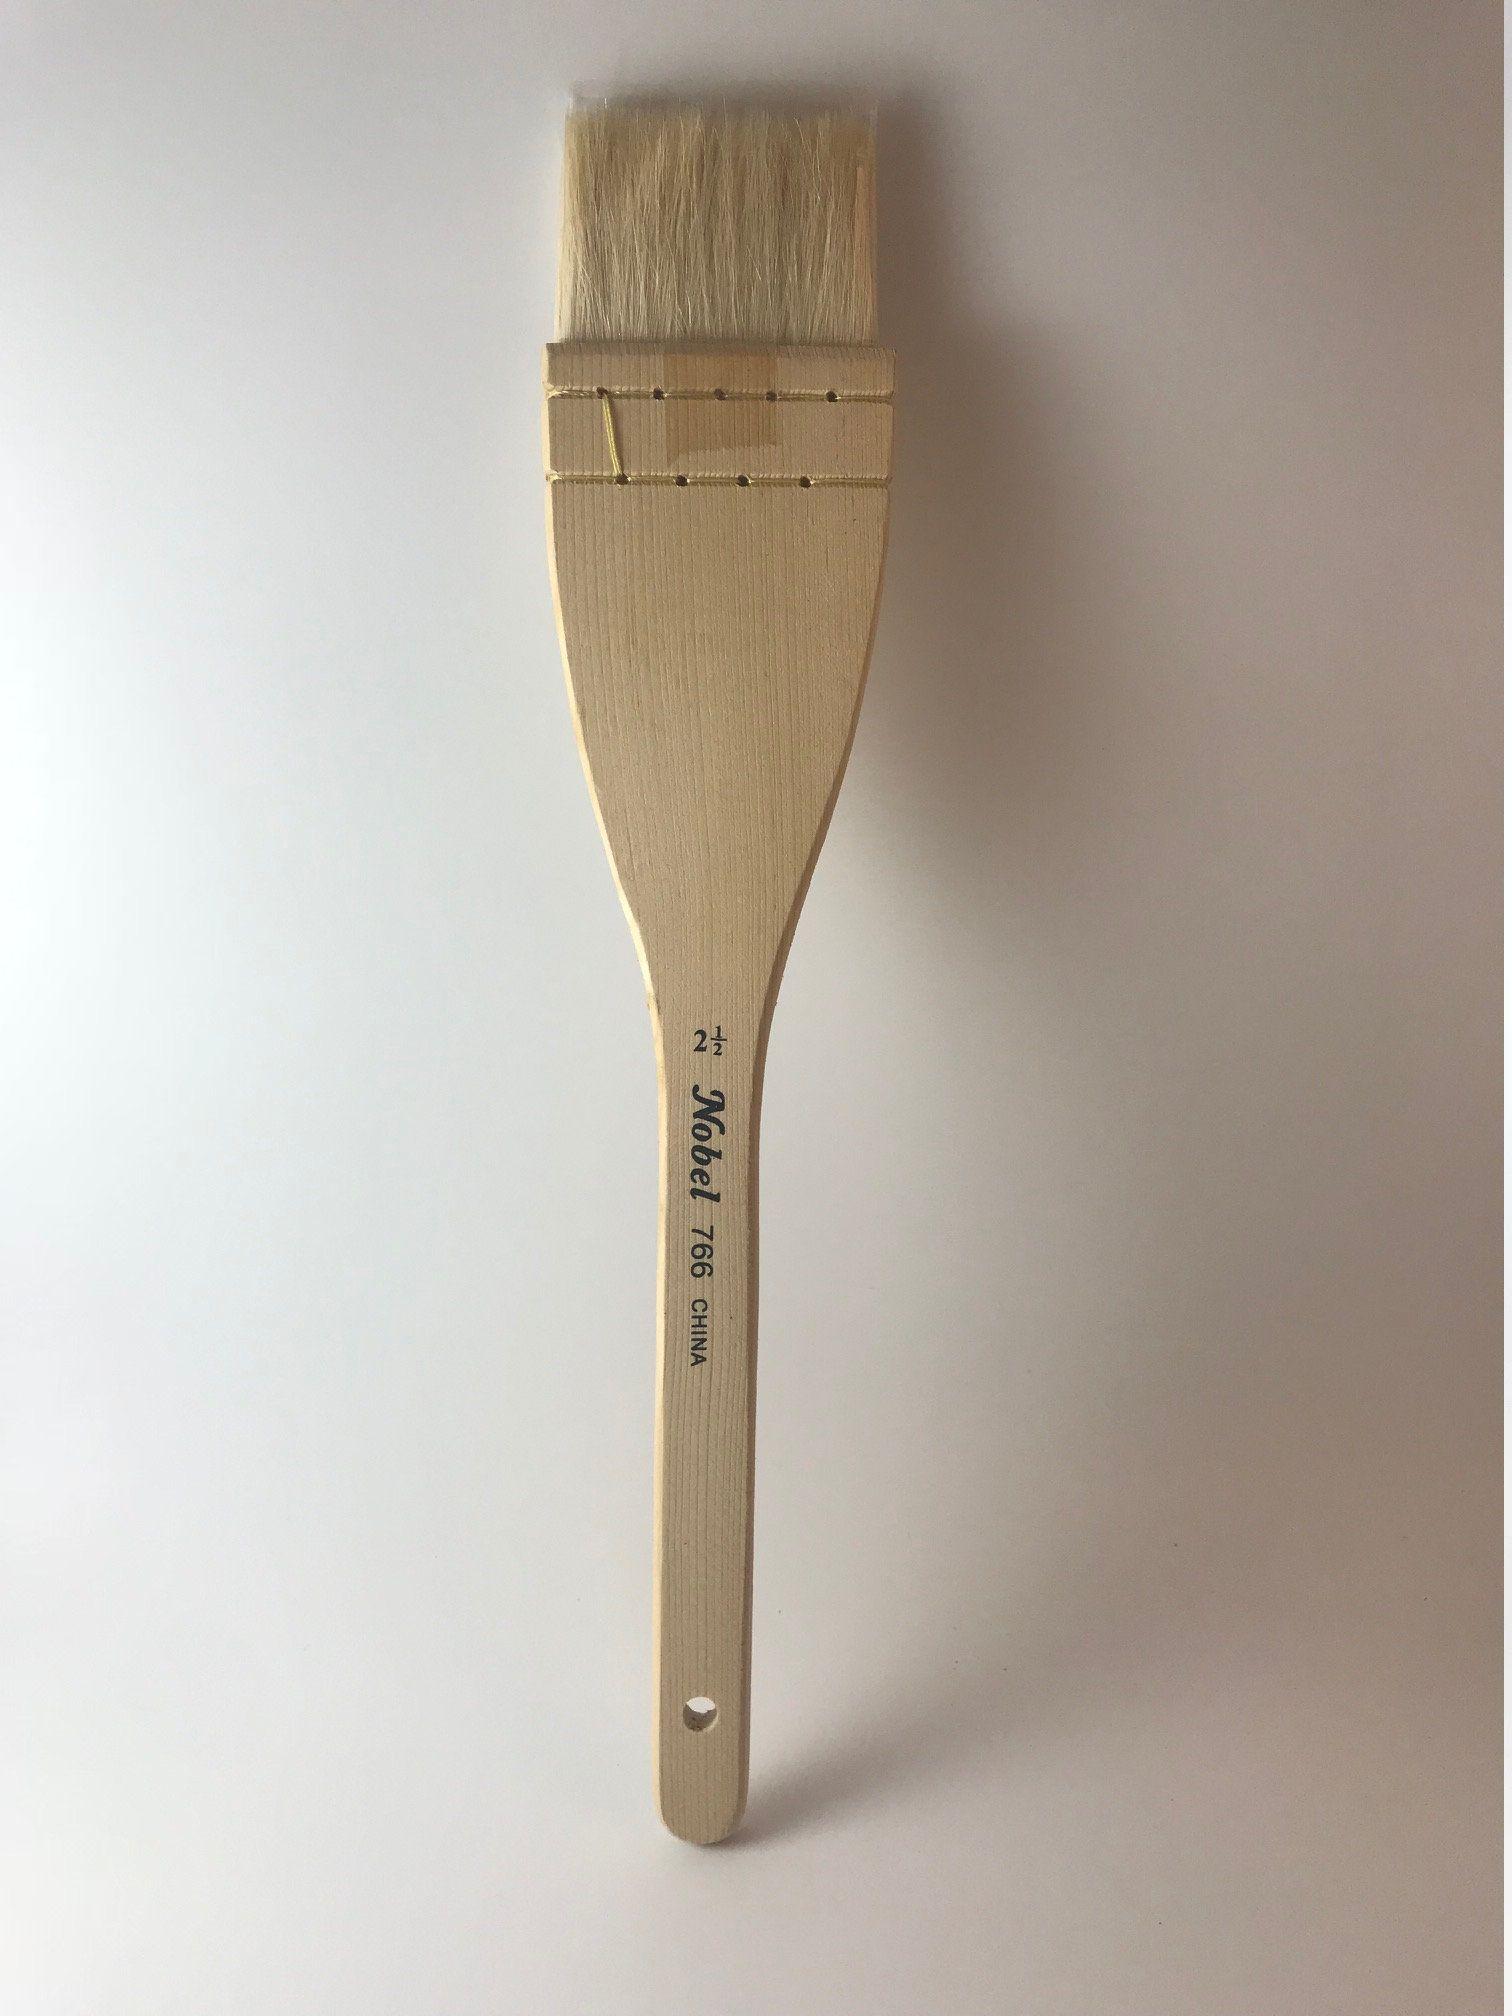 Hake Brush 2 1 2 Wide Flat Paintbrush Goat Hair Artist Brush Paint Brushes Wide Flats